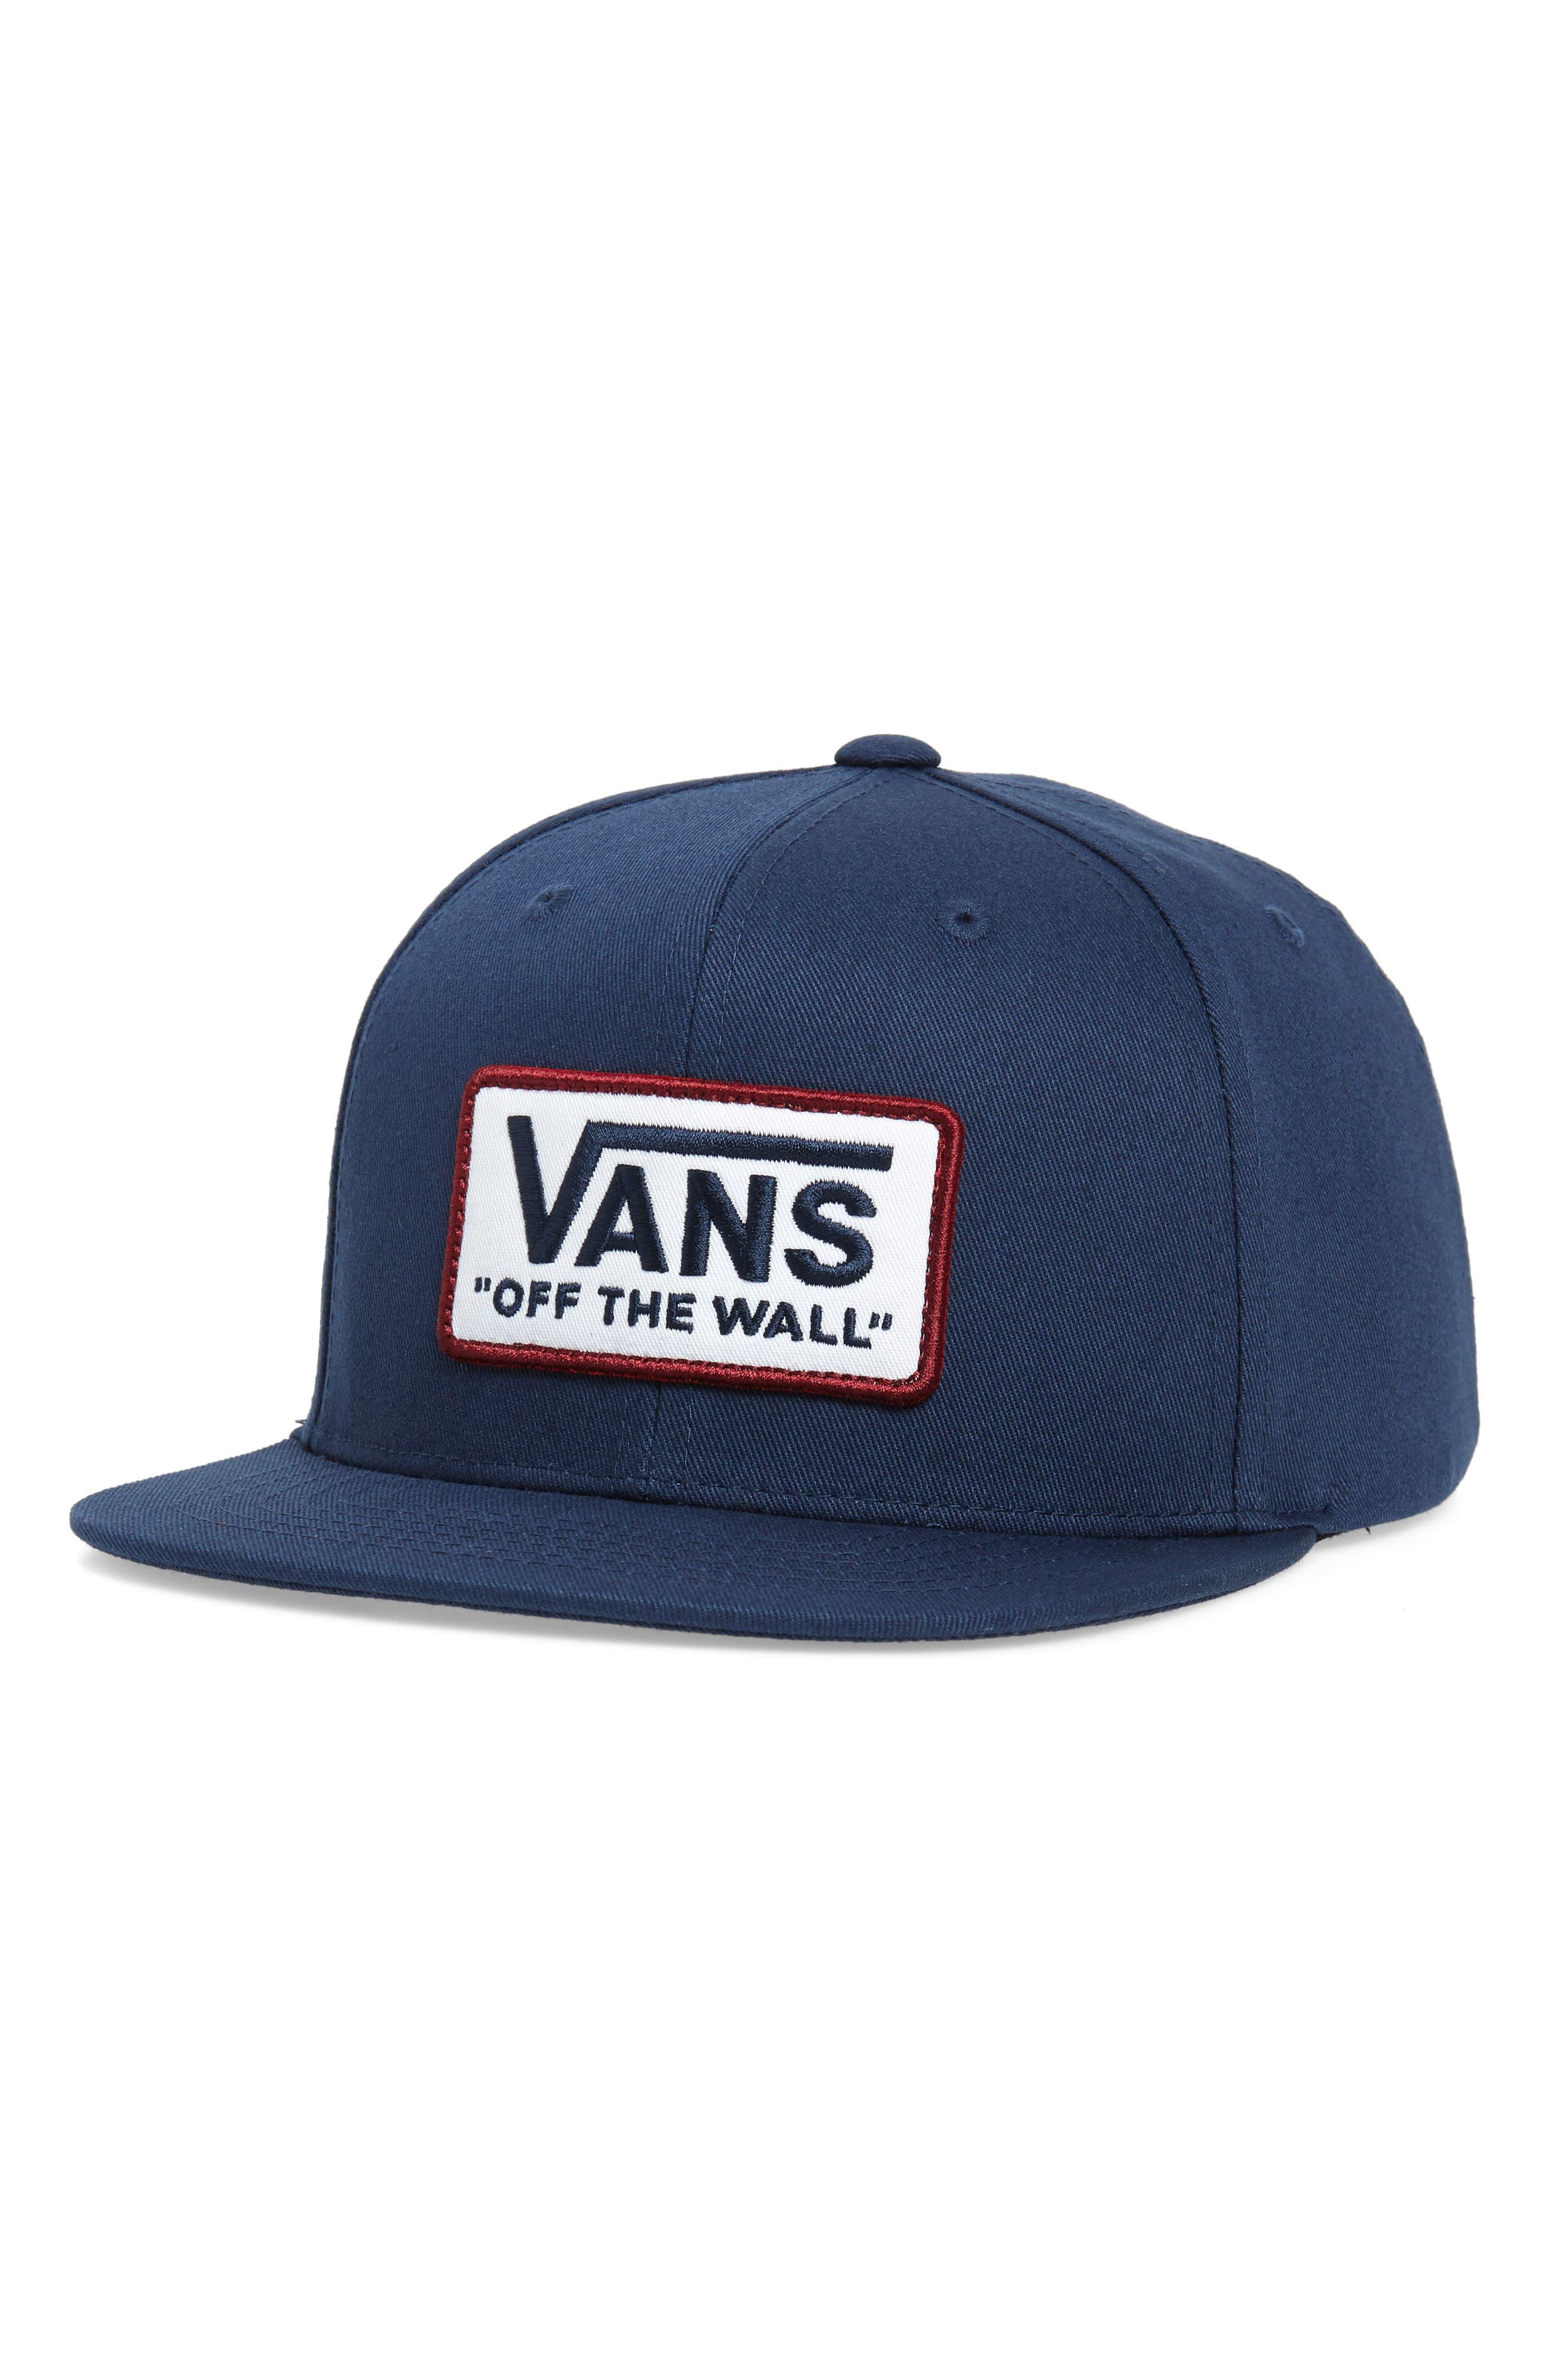 VANS Whitford Snapback Hat, Main, color, DRESS BLUES